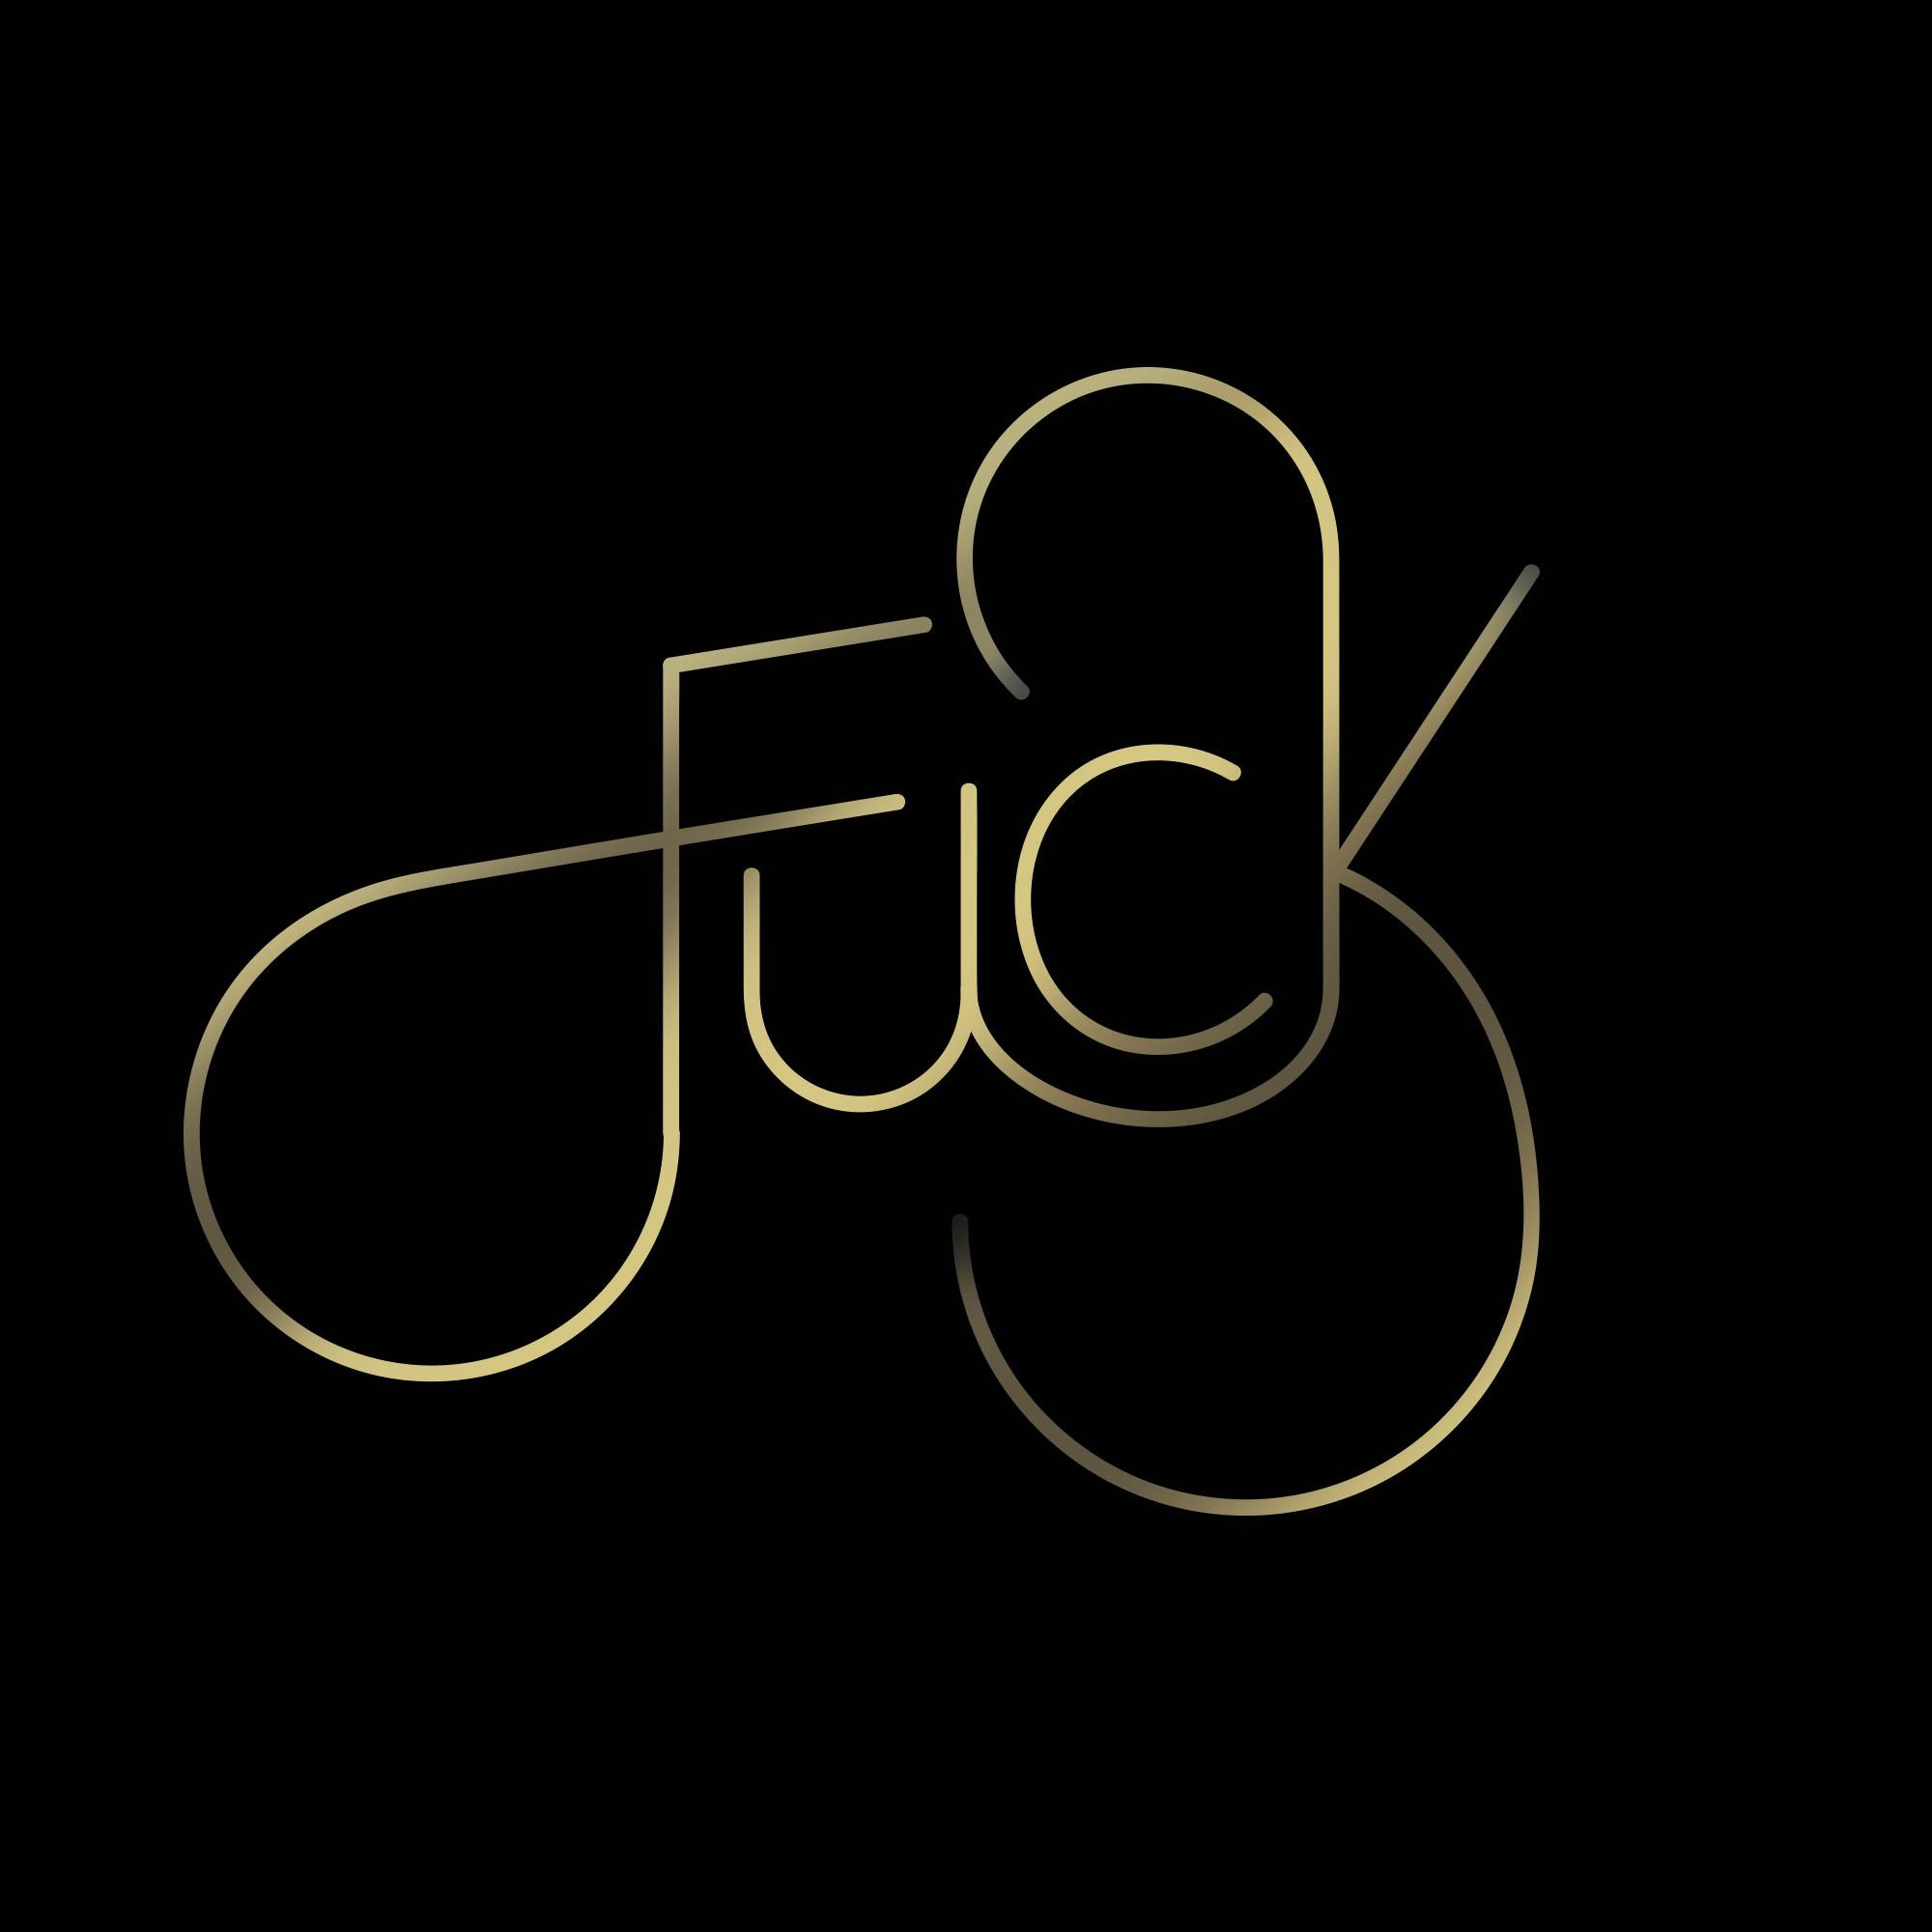 fucktype-1